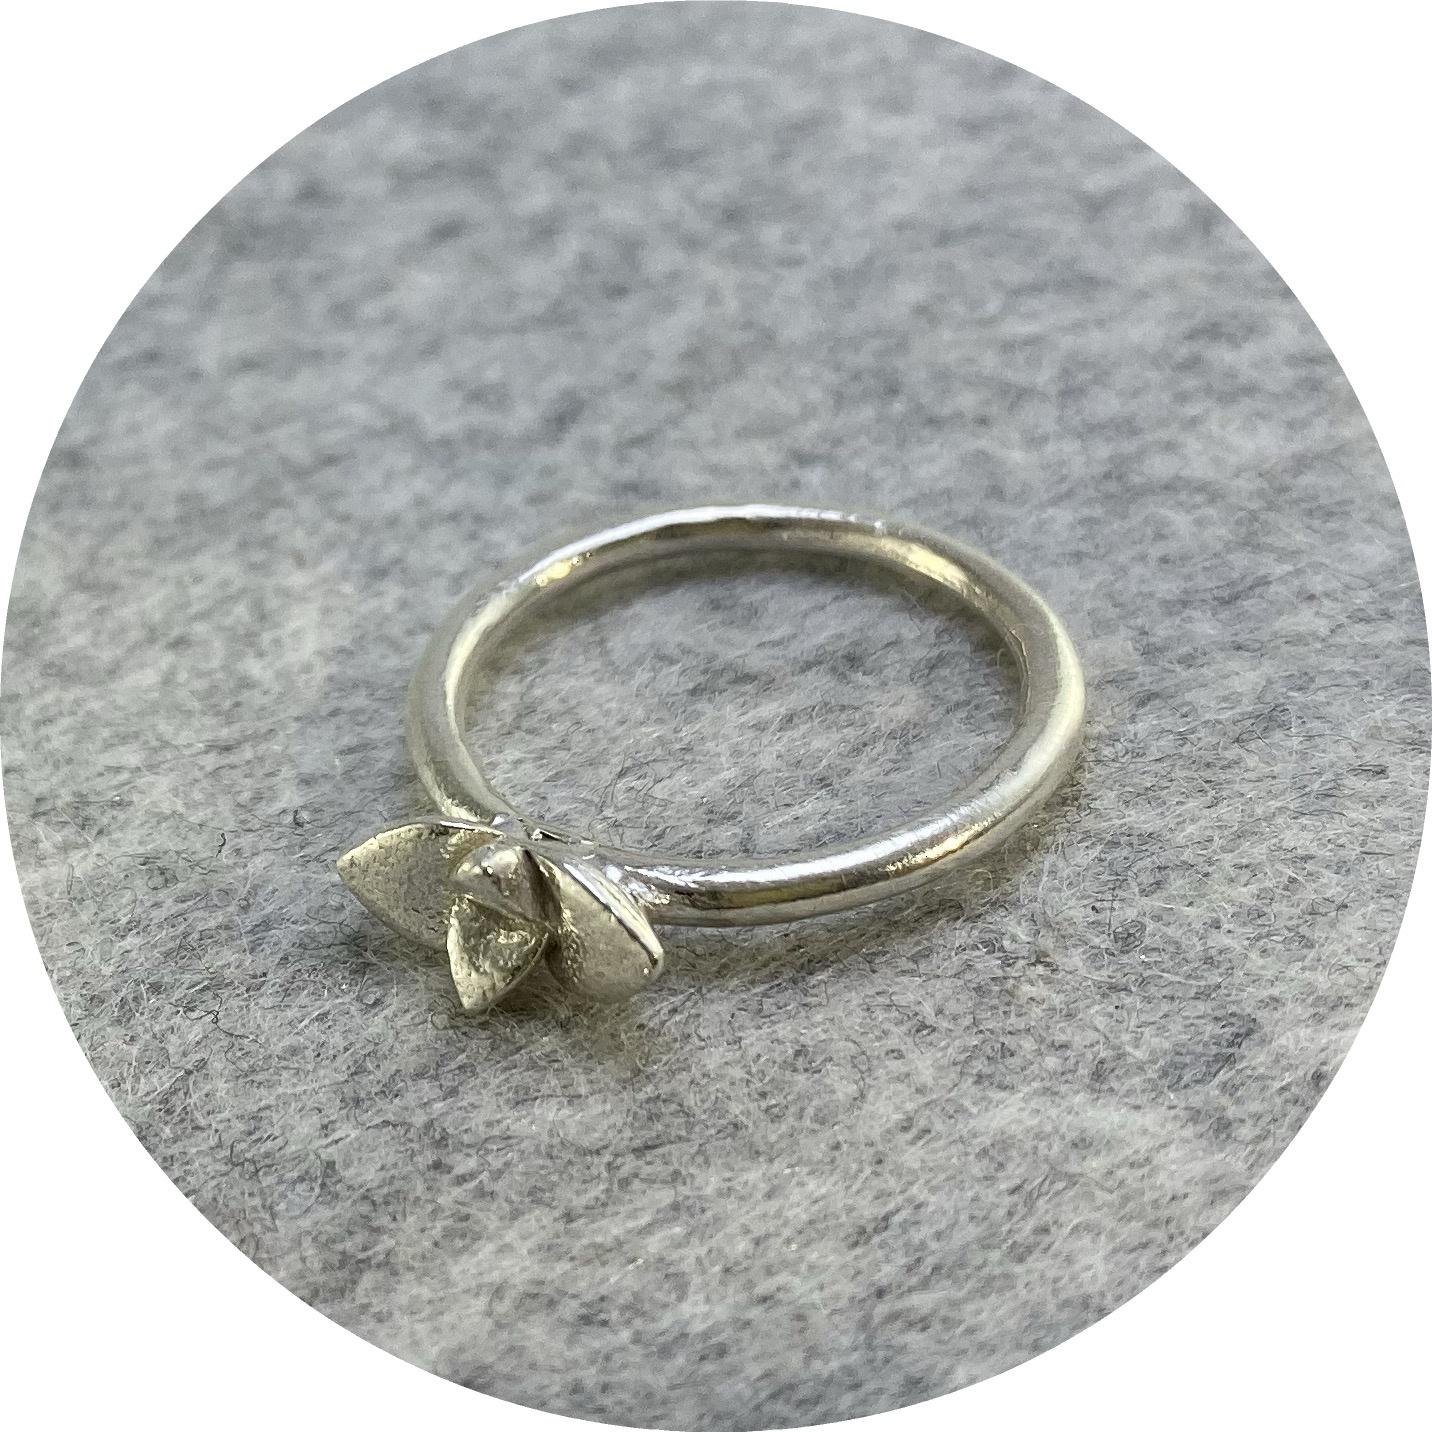 Manuela Igreja- Tiny Crassula ring.